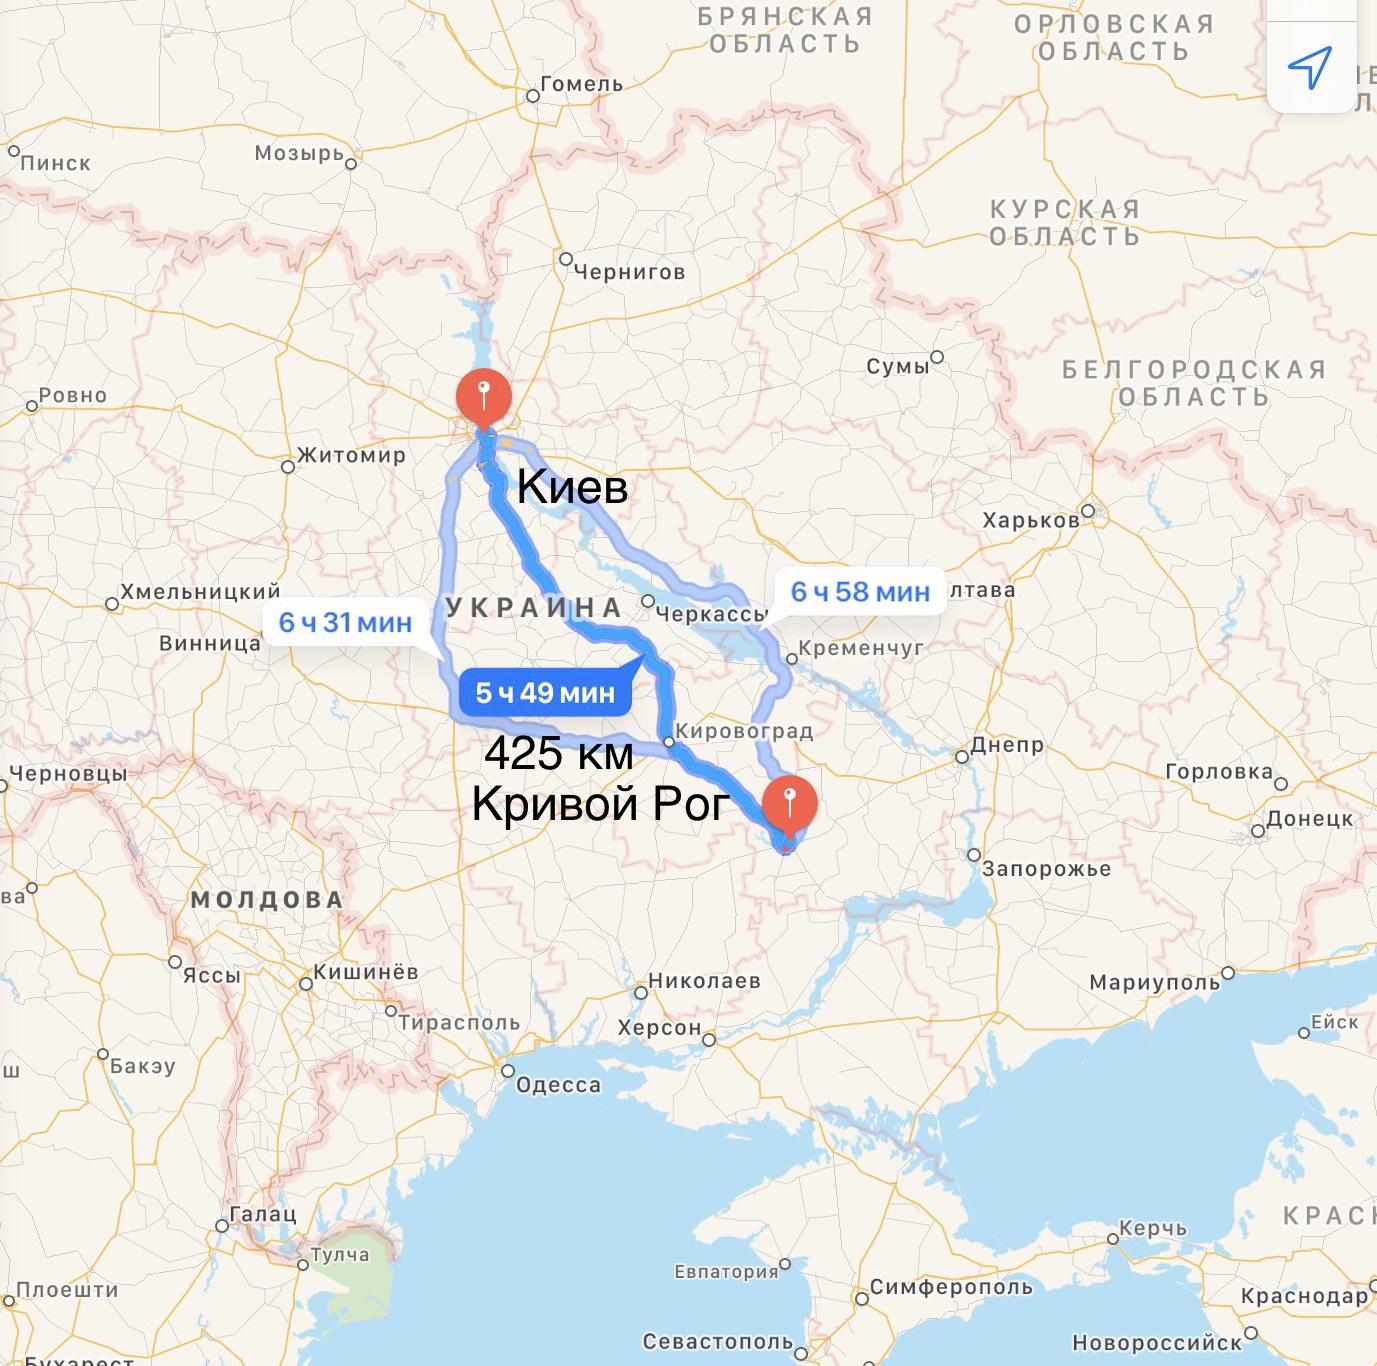 Грузоперевозки Киев – Кривой Рог